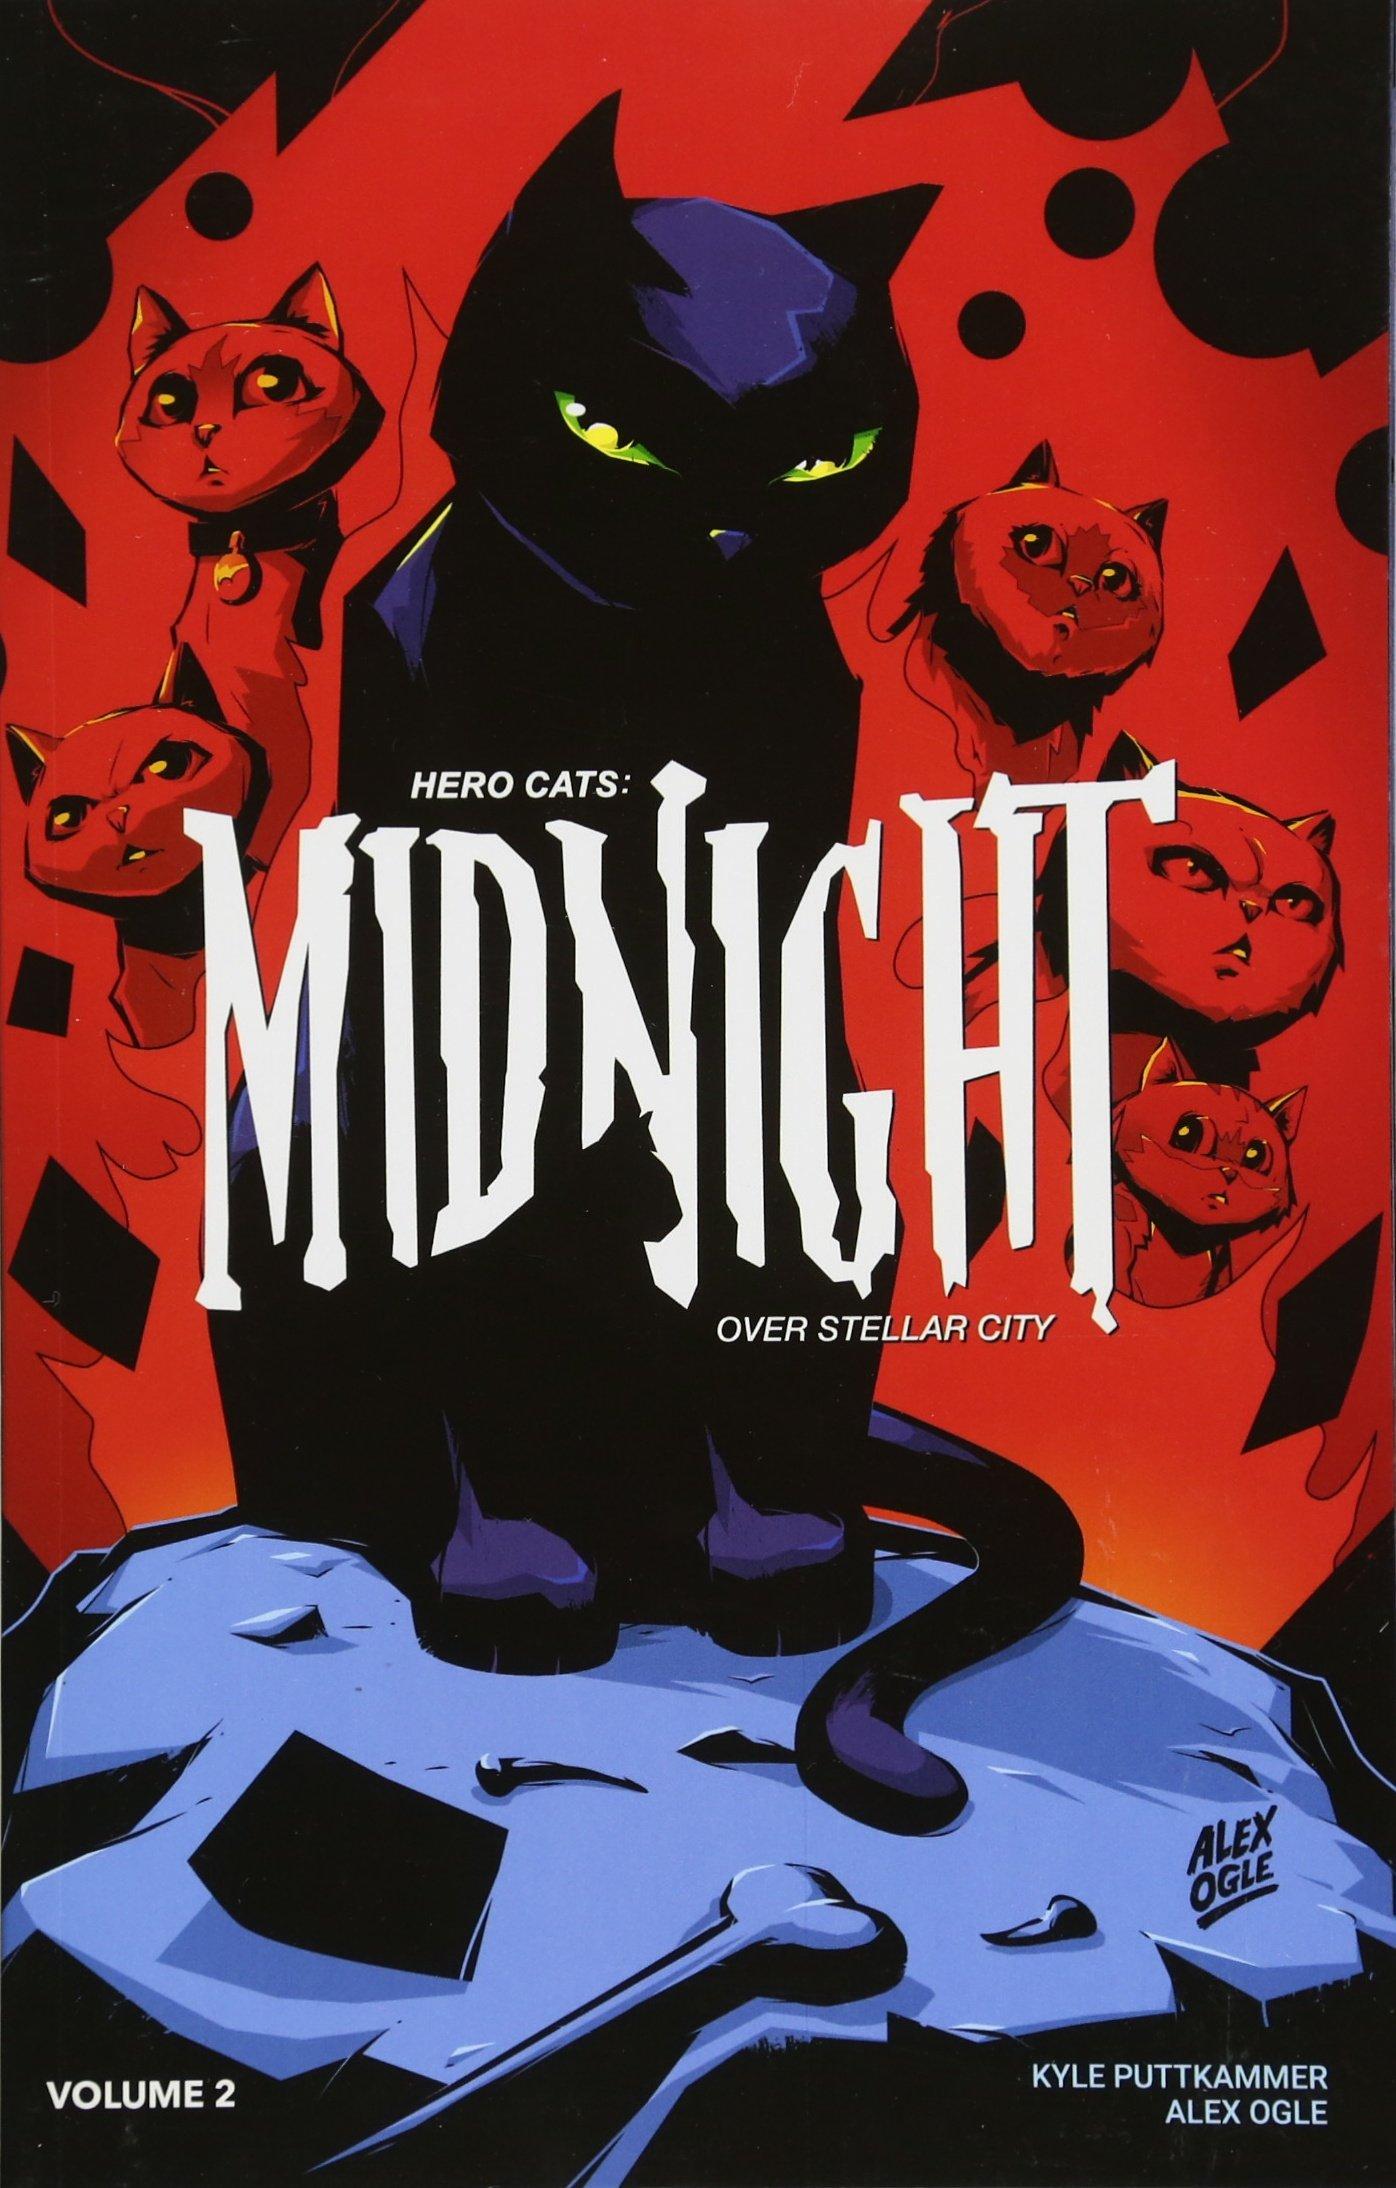 Download Hero Cats: Midnight Over Stellar City Volume 2 pdf epub